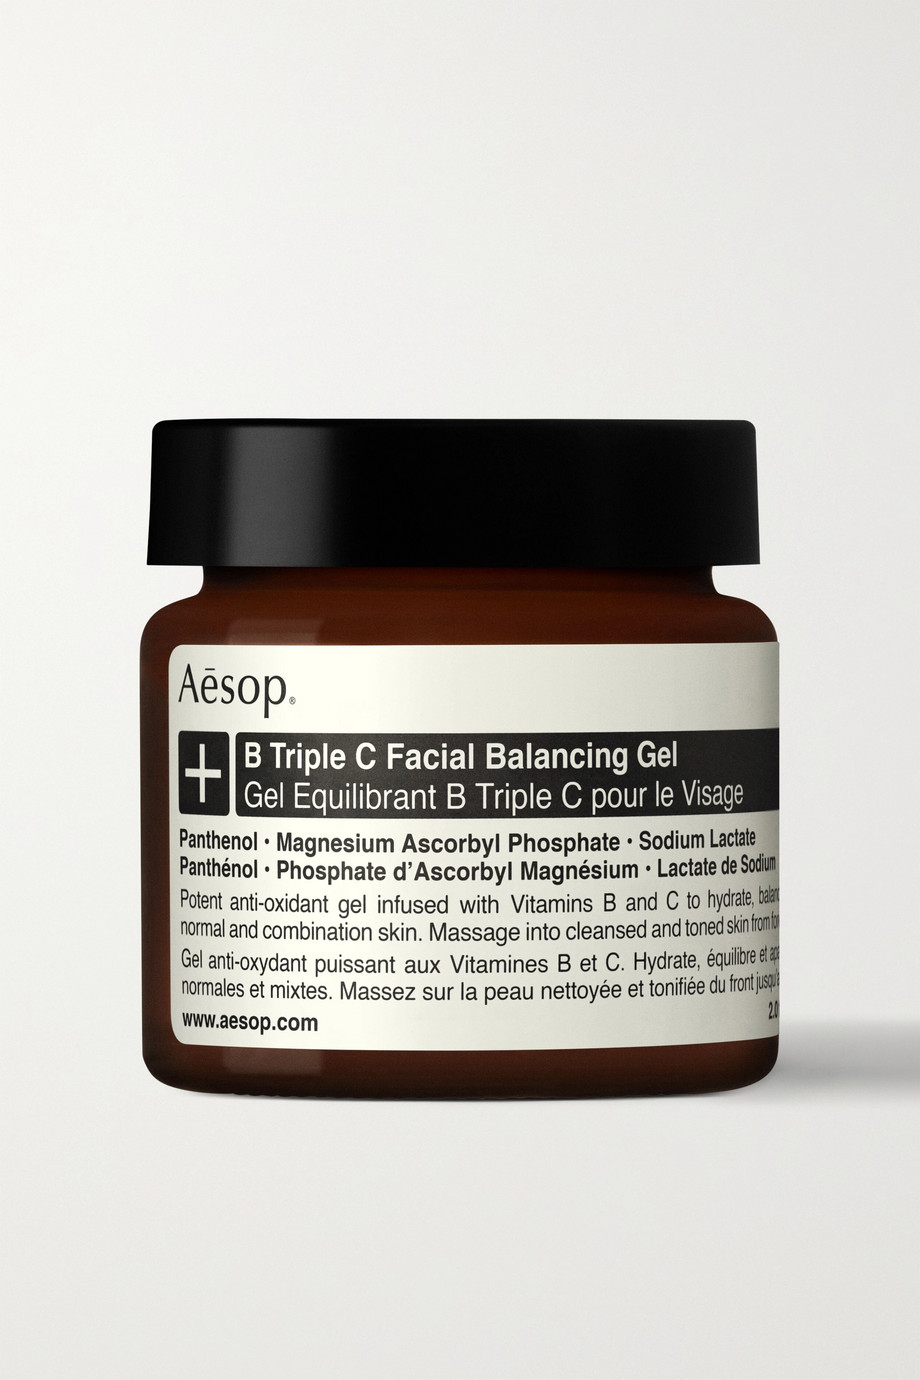 Aesop B 三倍 C 肌肤调理凝露,60ml